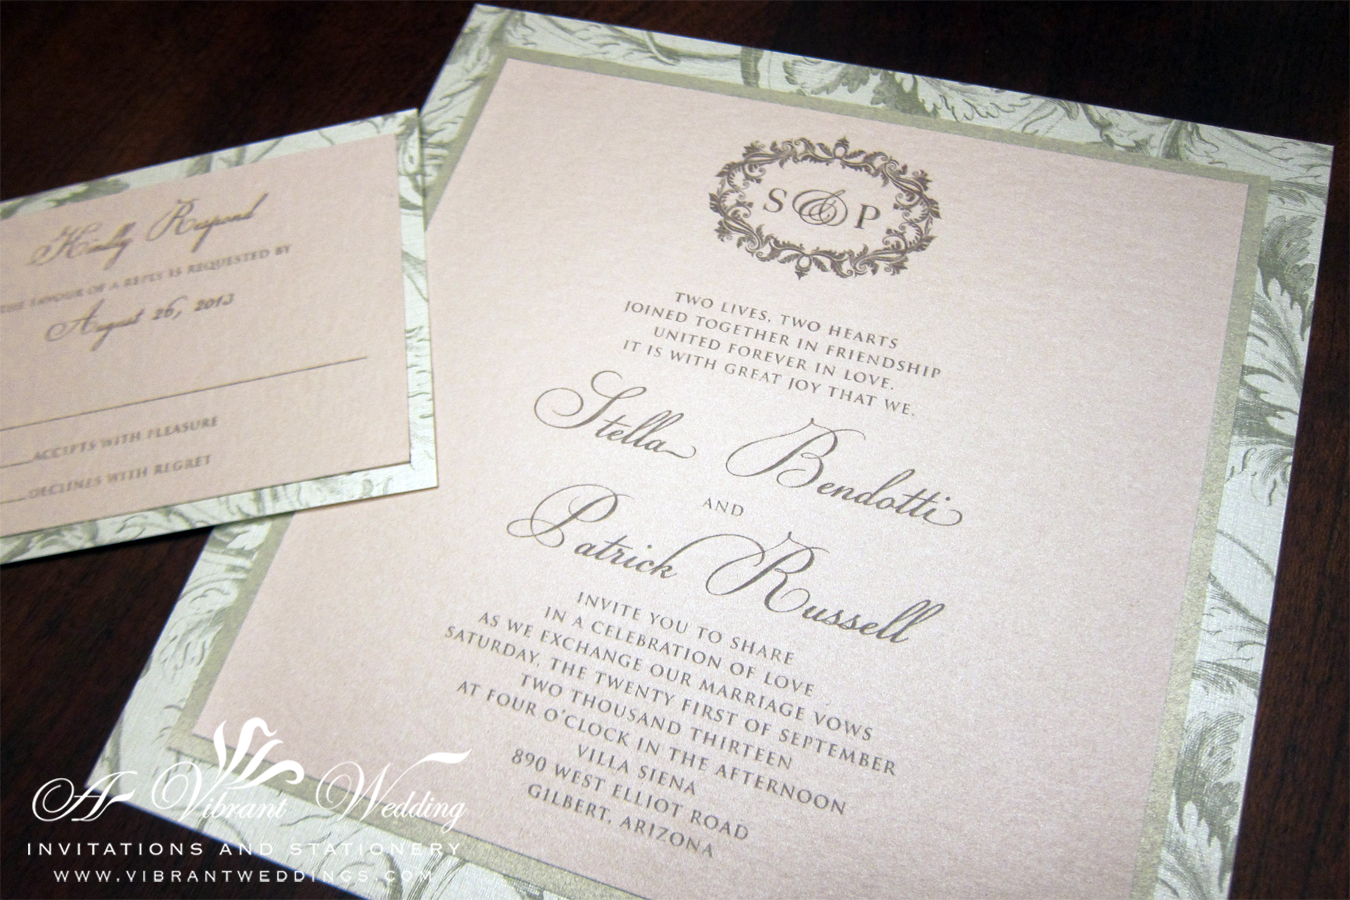 victorian wedding invitation blush wedding invitations Triple layered Blush and Champagne Wedding Invitation with Plumes Leaf Scroll Pattern Border